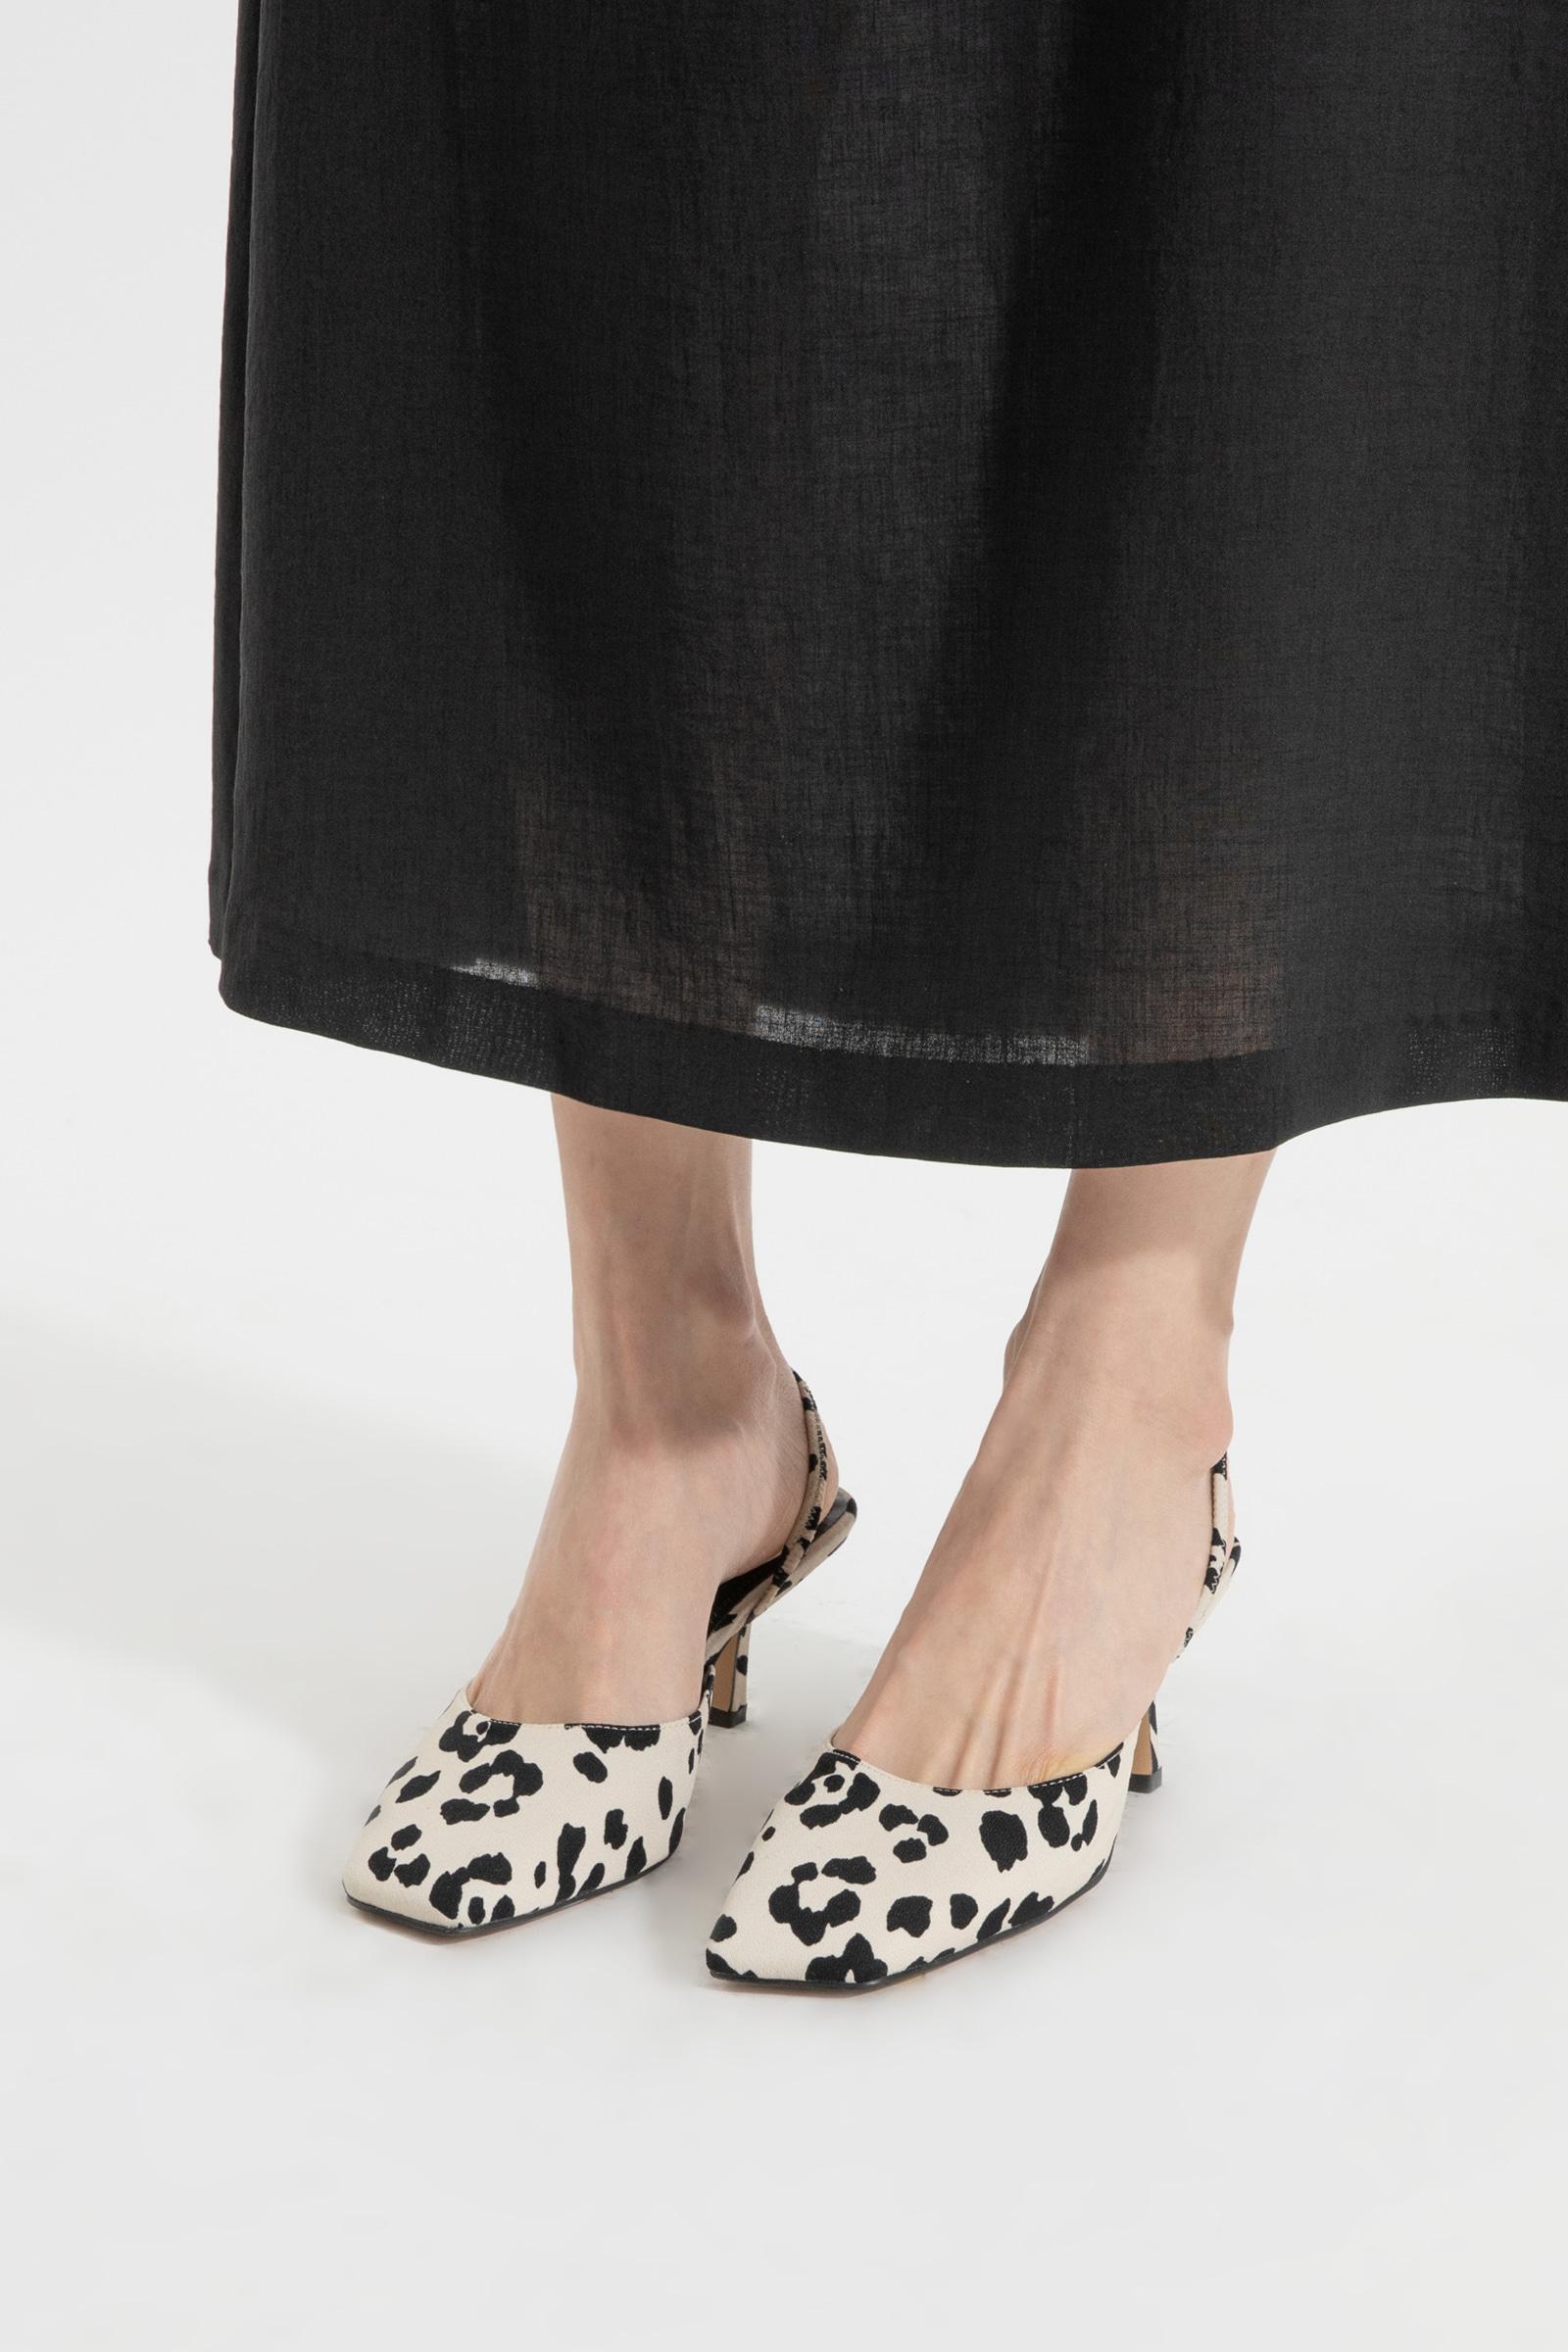 Jenny Square High Heel Sandals